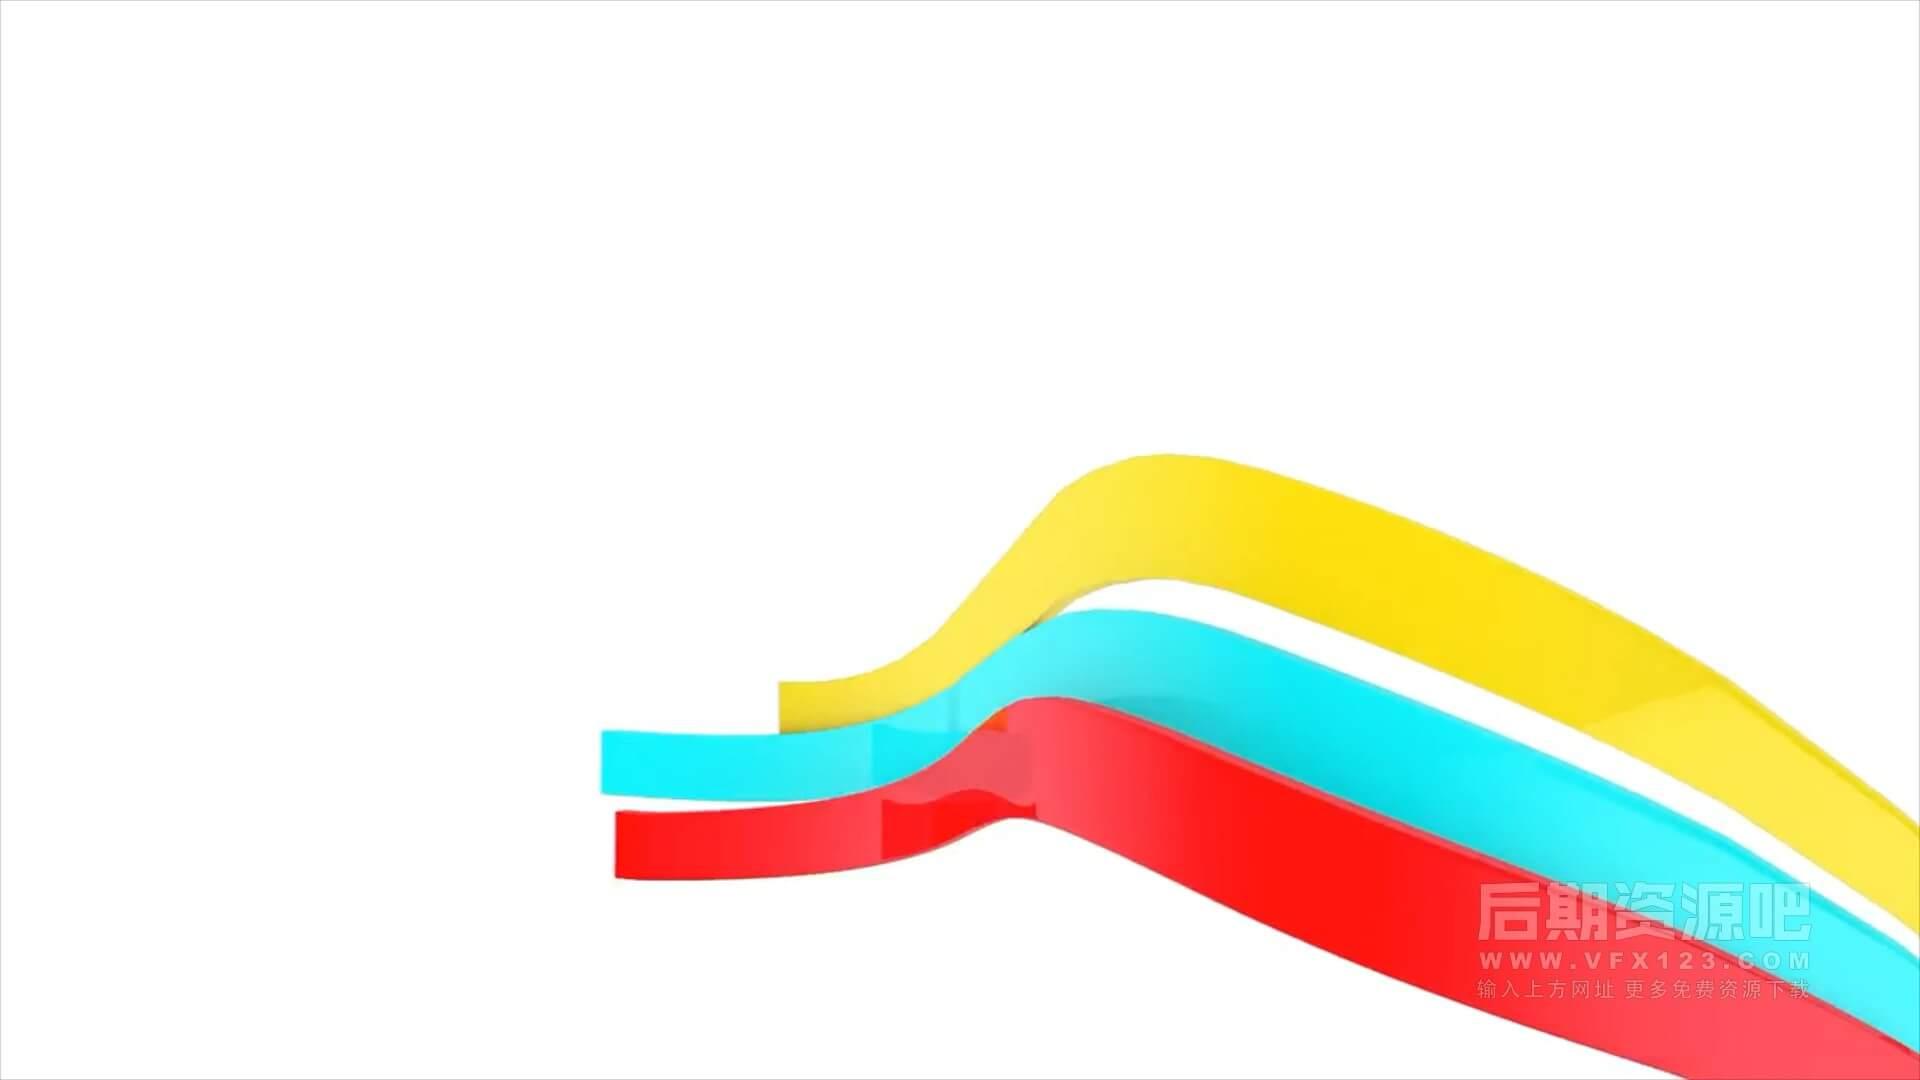 fcpx主题模板 3D简约LOGO徽标演绎片头模板 3D Ribbons Logo